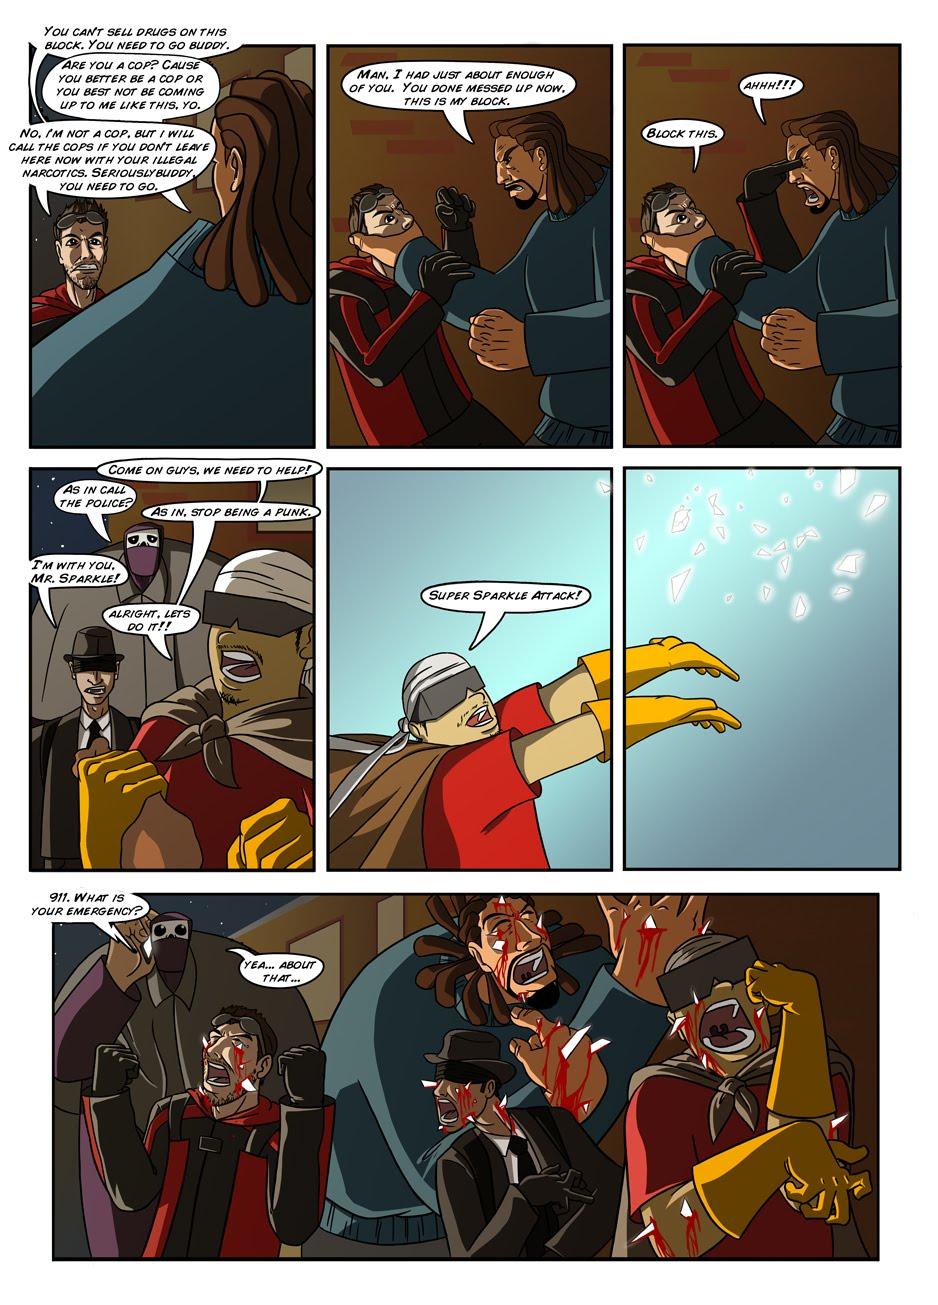 WSC: Kickass Adventure Part 4, Conclusion